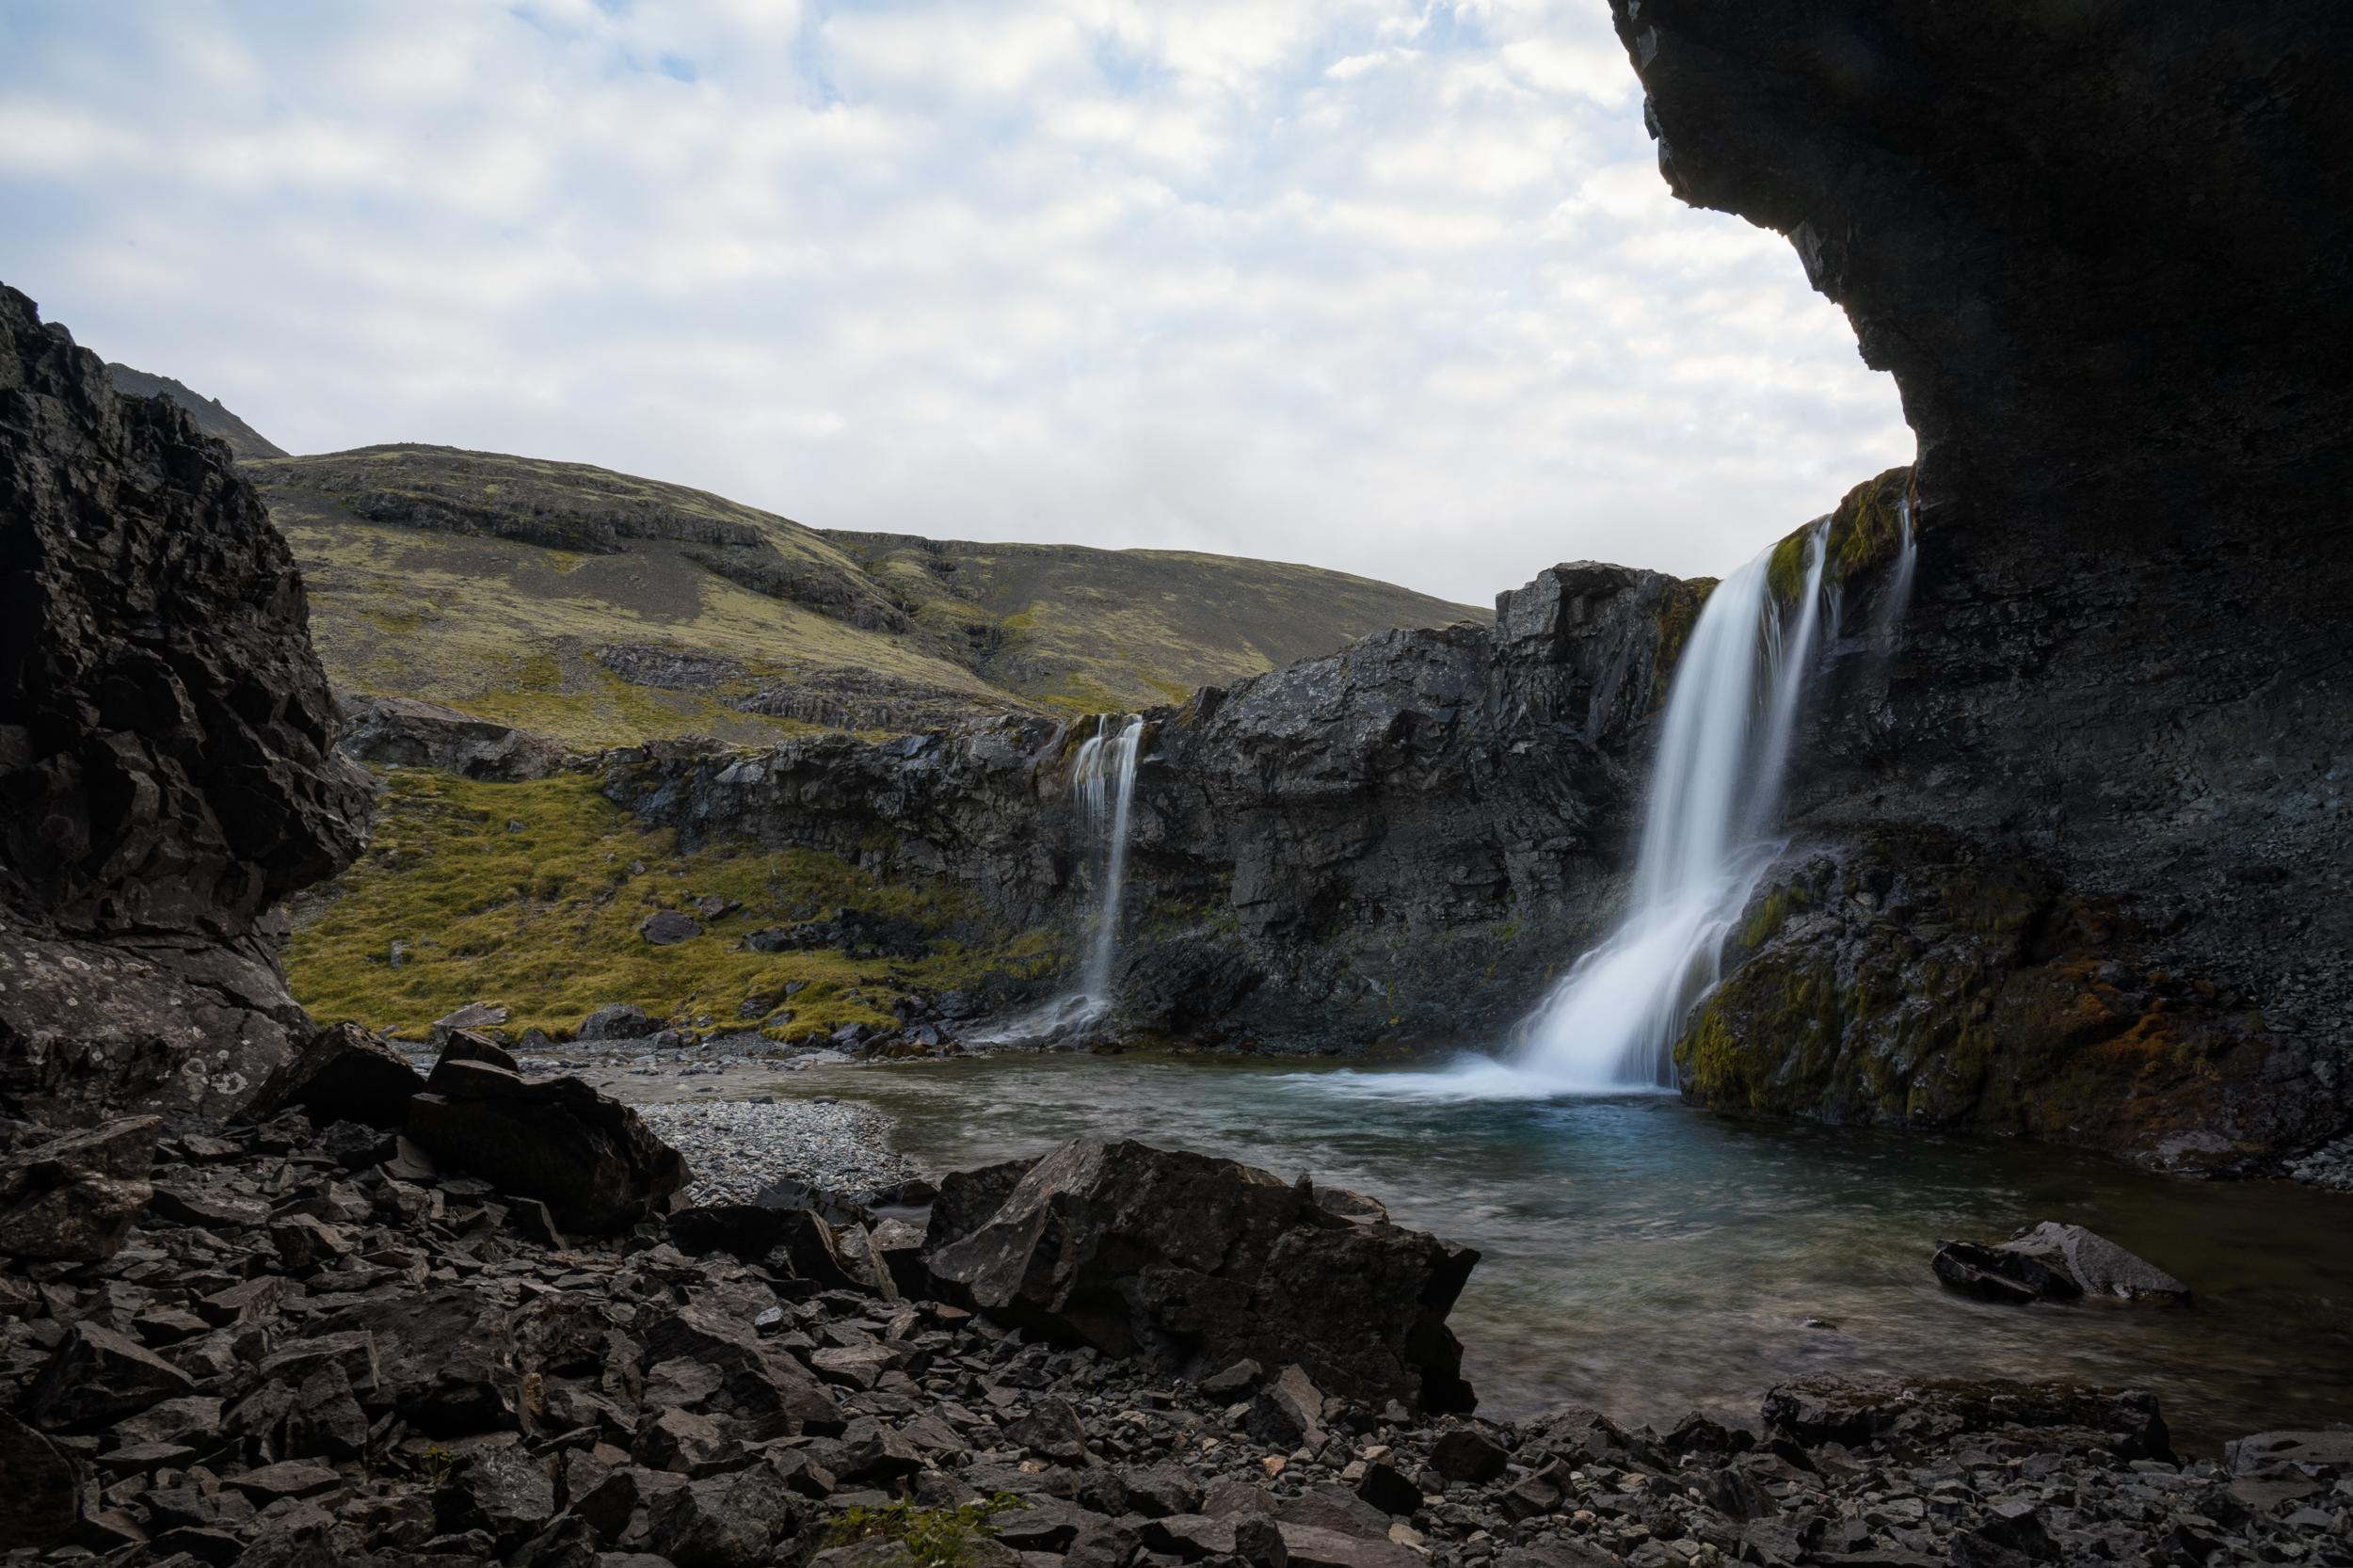 Iceland - 00323-HDR_ME - Chris Goetchius 2017 - WEB UPLOAD ONLY.jpg